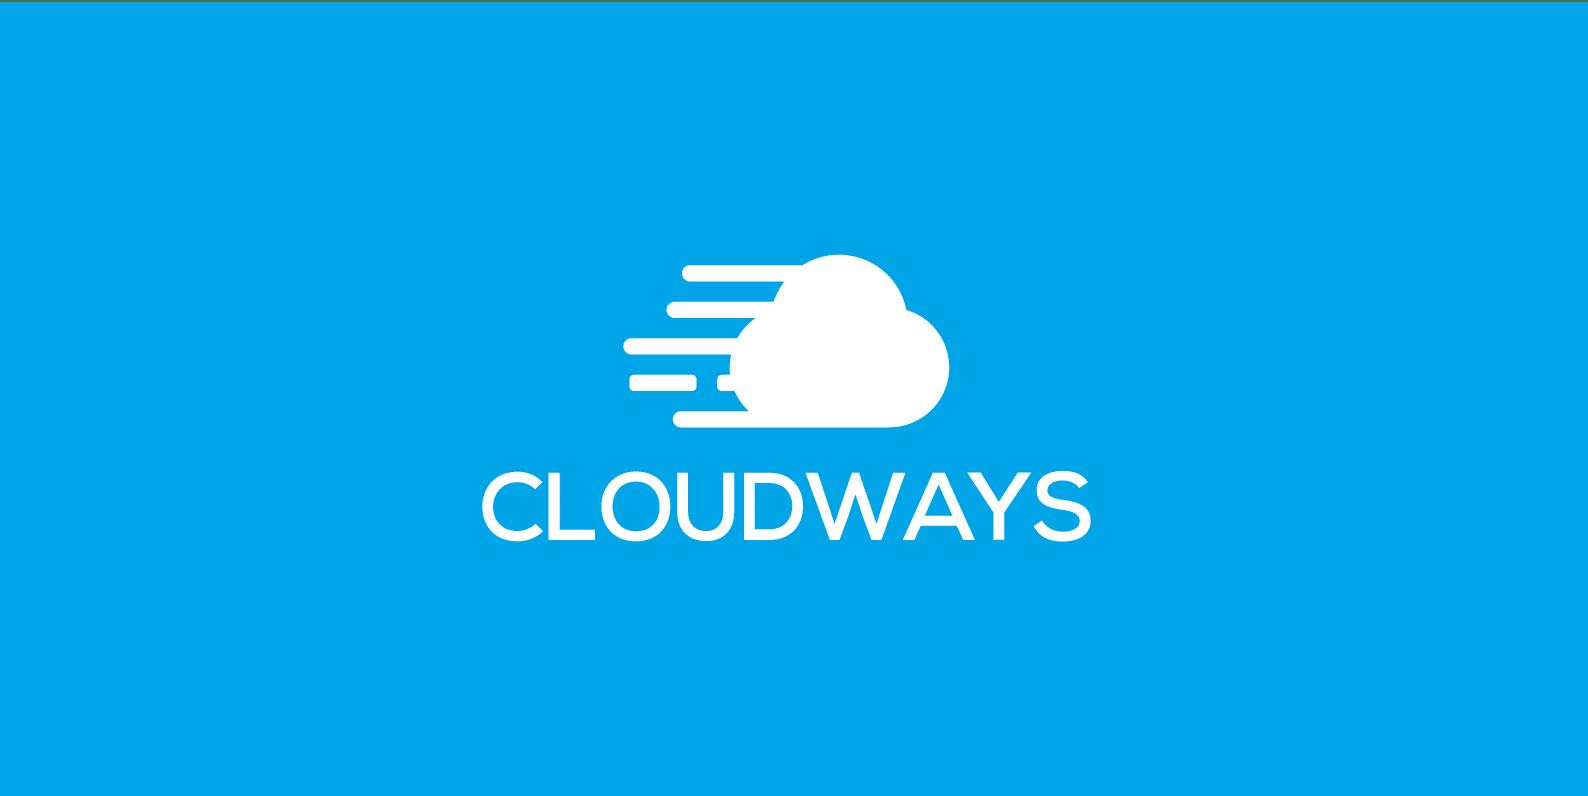 cloudways-cloud-server-hosting